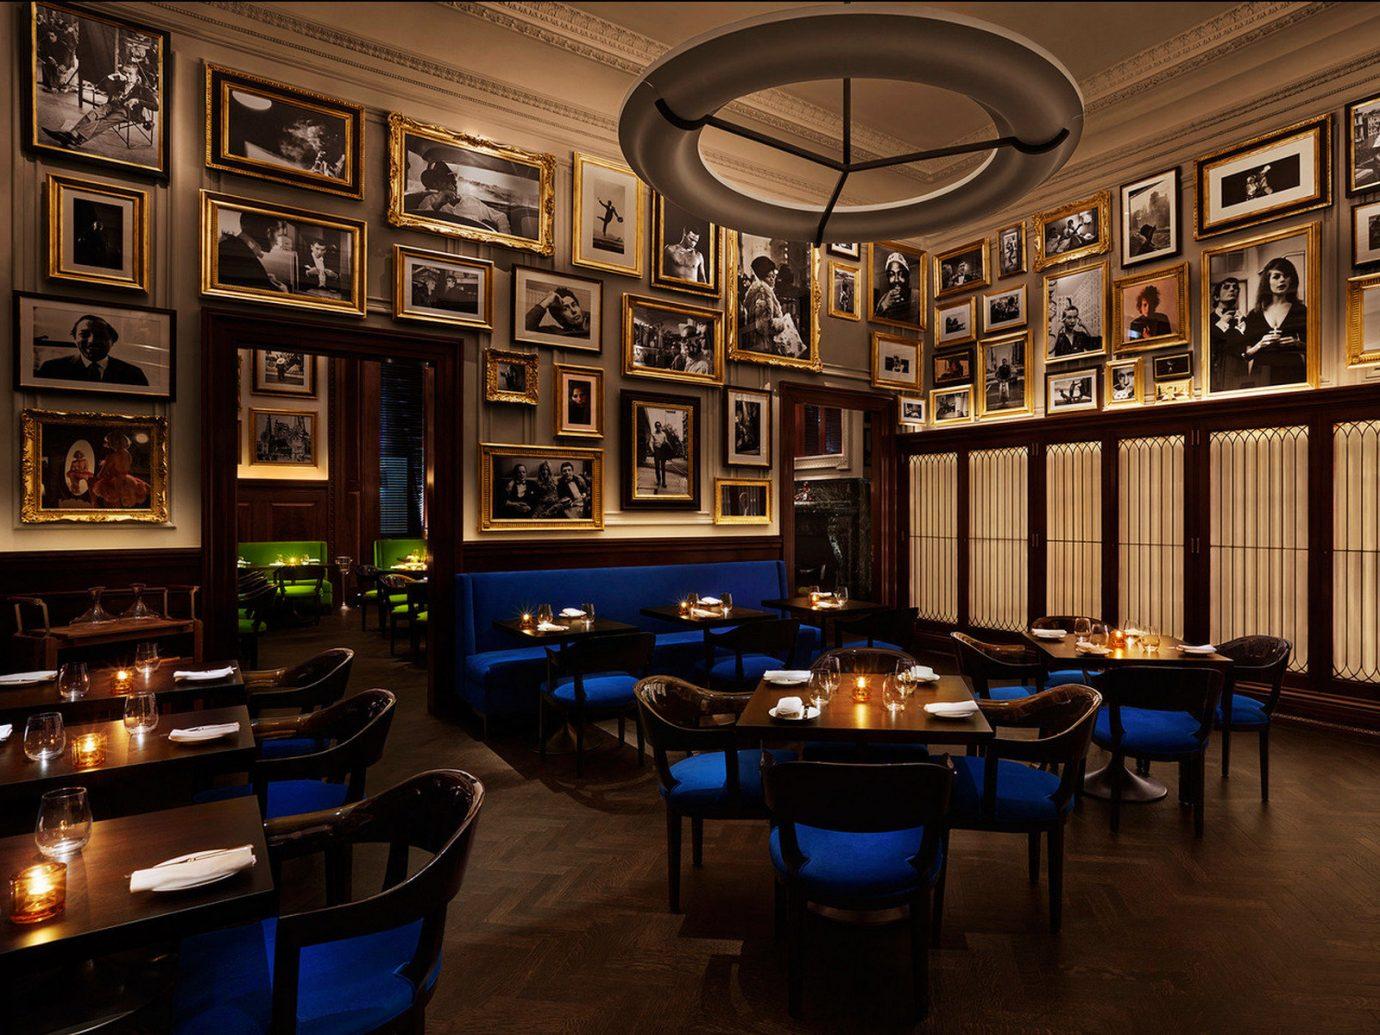 The New York EDITION, Bar Dining Drink Eat Hotels NYC indoor room building recreation room estate interior design home Design restaurant several